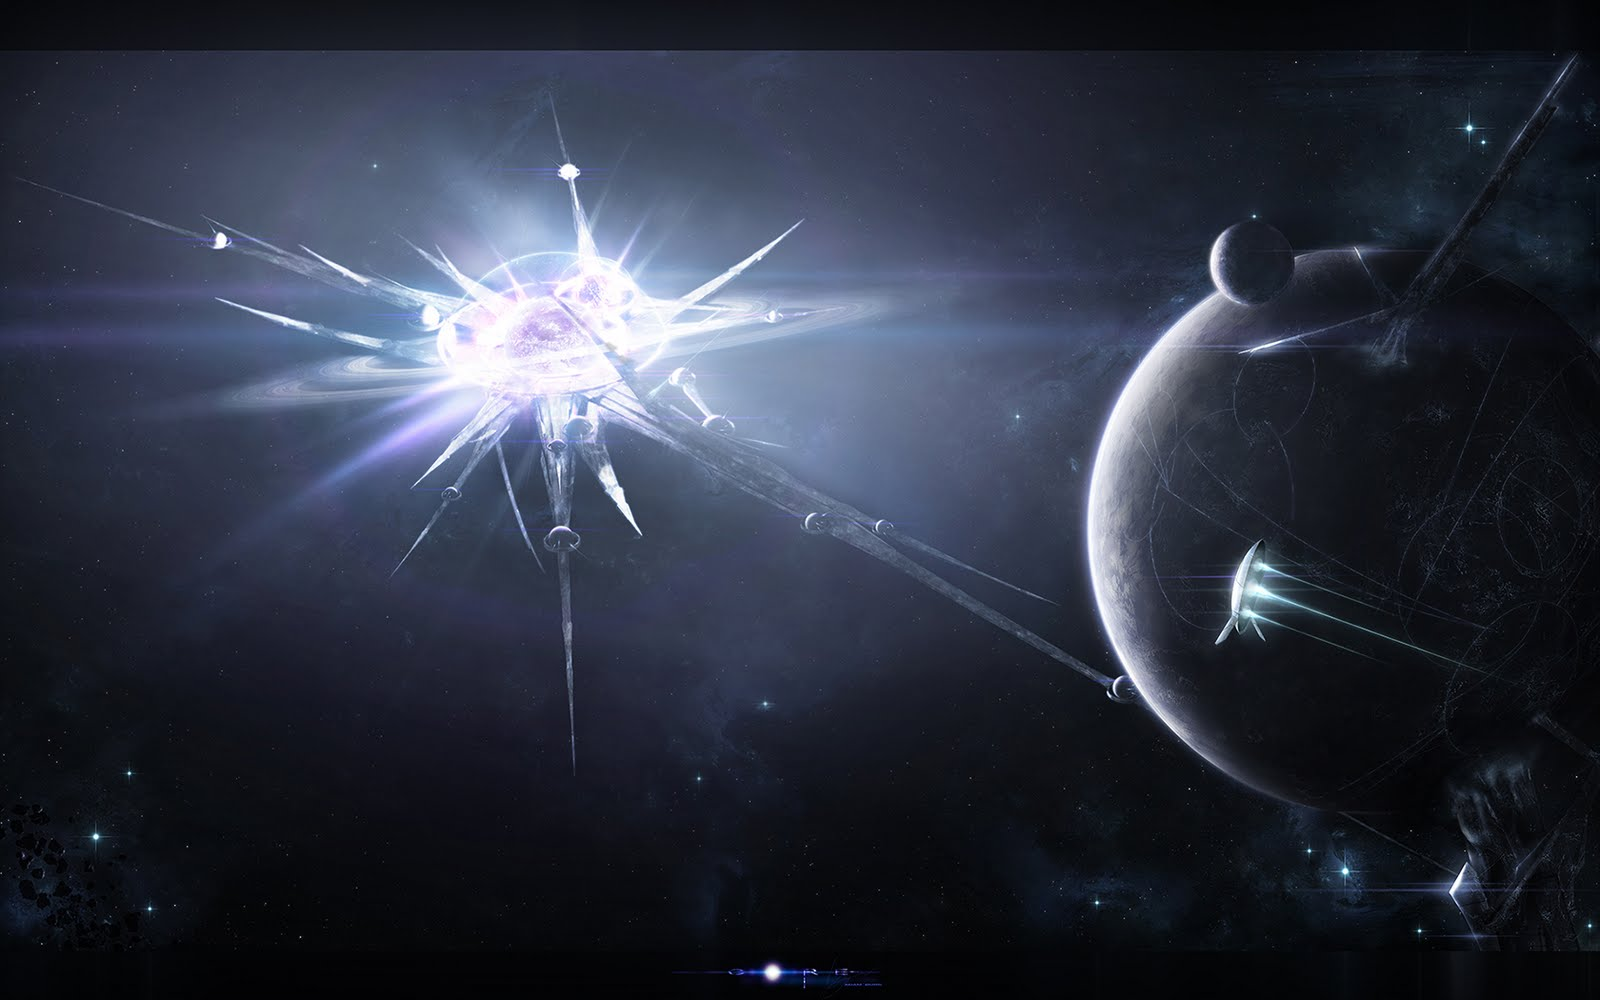 Hd space wallpaper 1080p ushasree 39 s blog - Spacecraft wallpaper ...